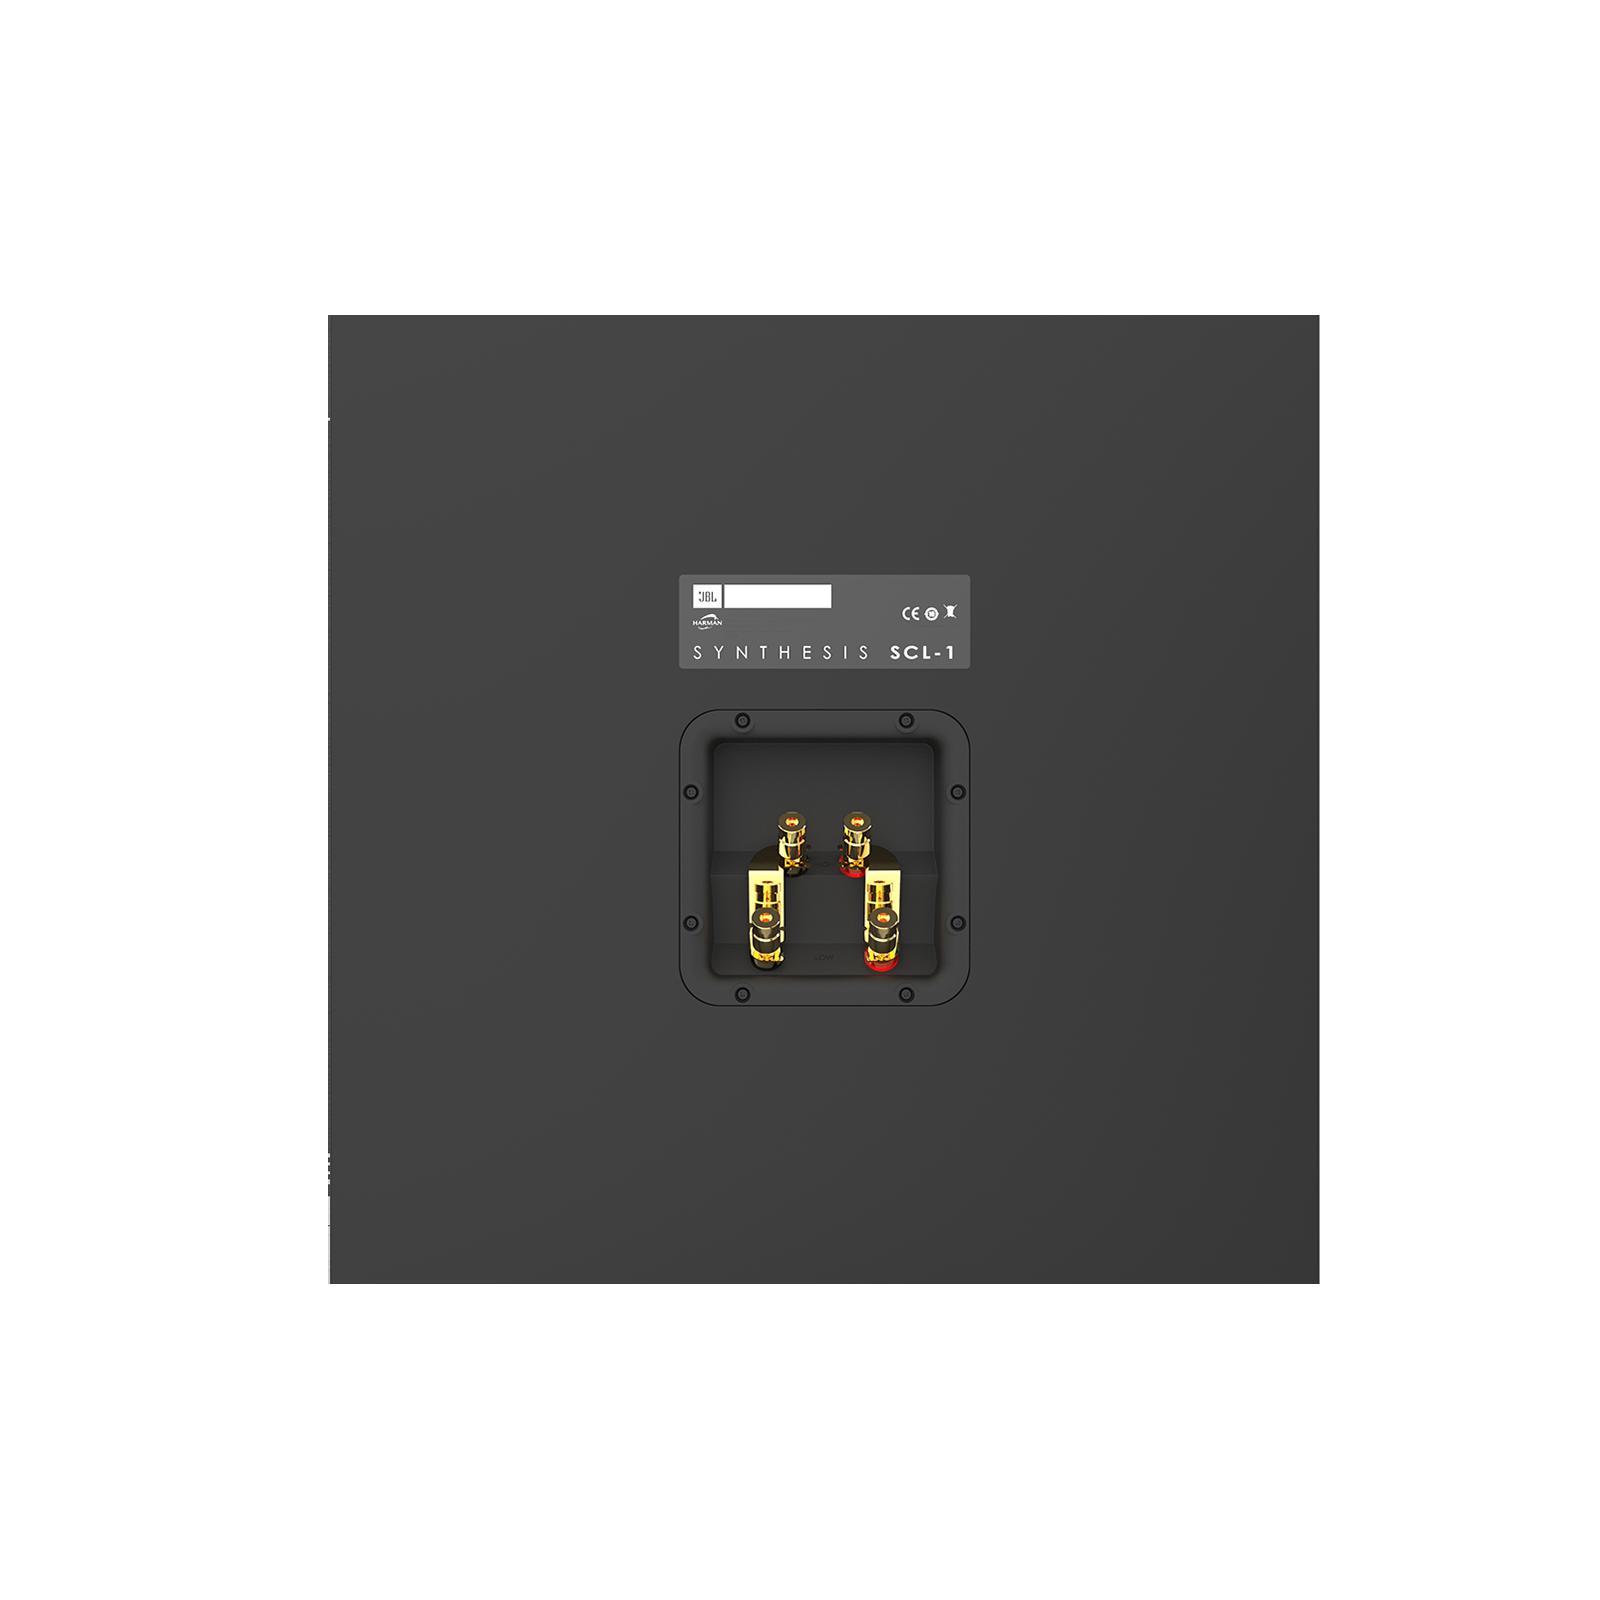 SCL-1 - Black - 2-Way Dual 12-inch (300mm) Custom LCR Loudspeaker - Detailshot 15